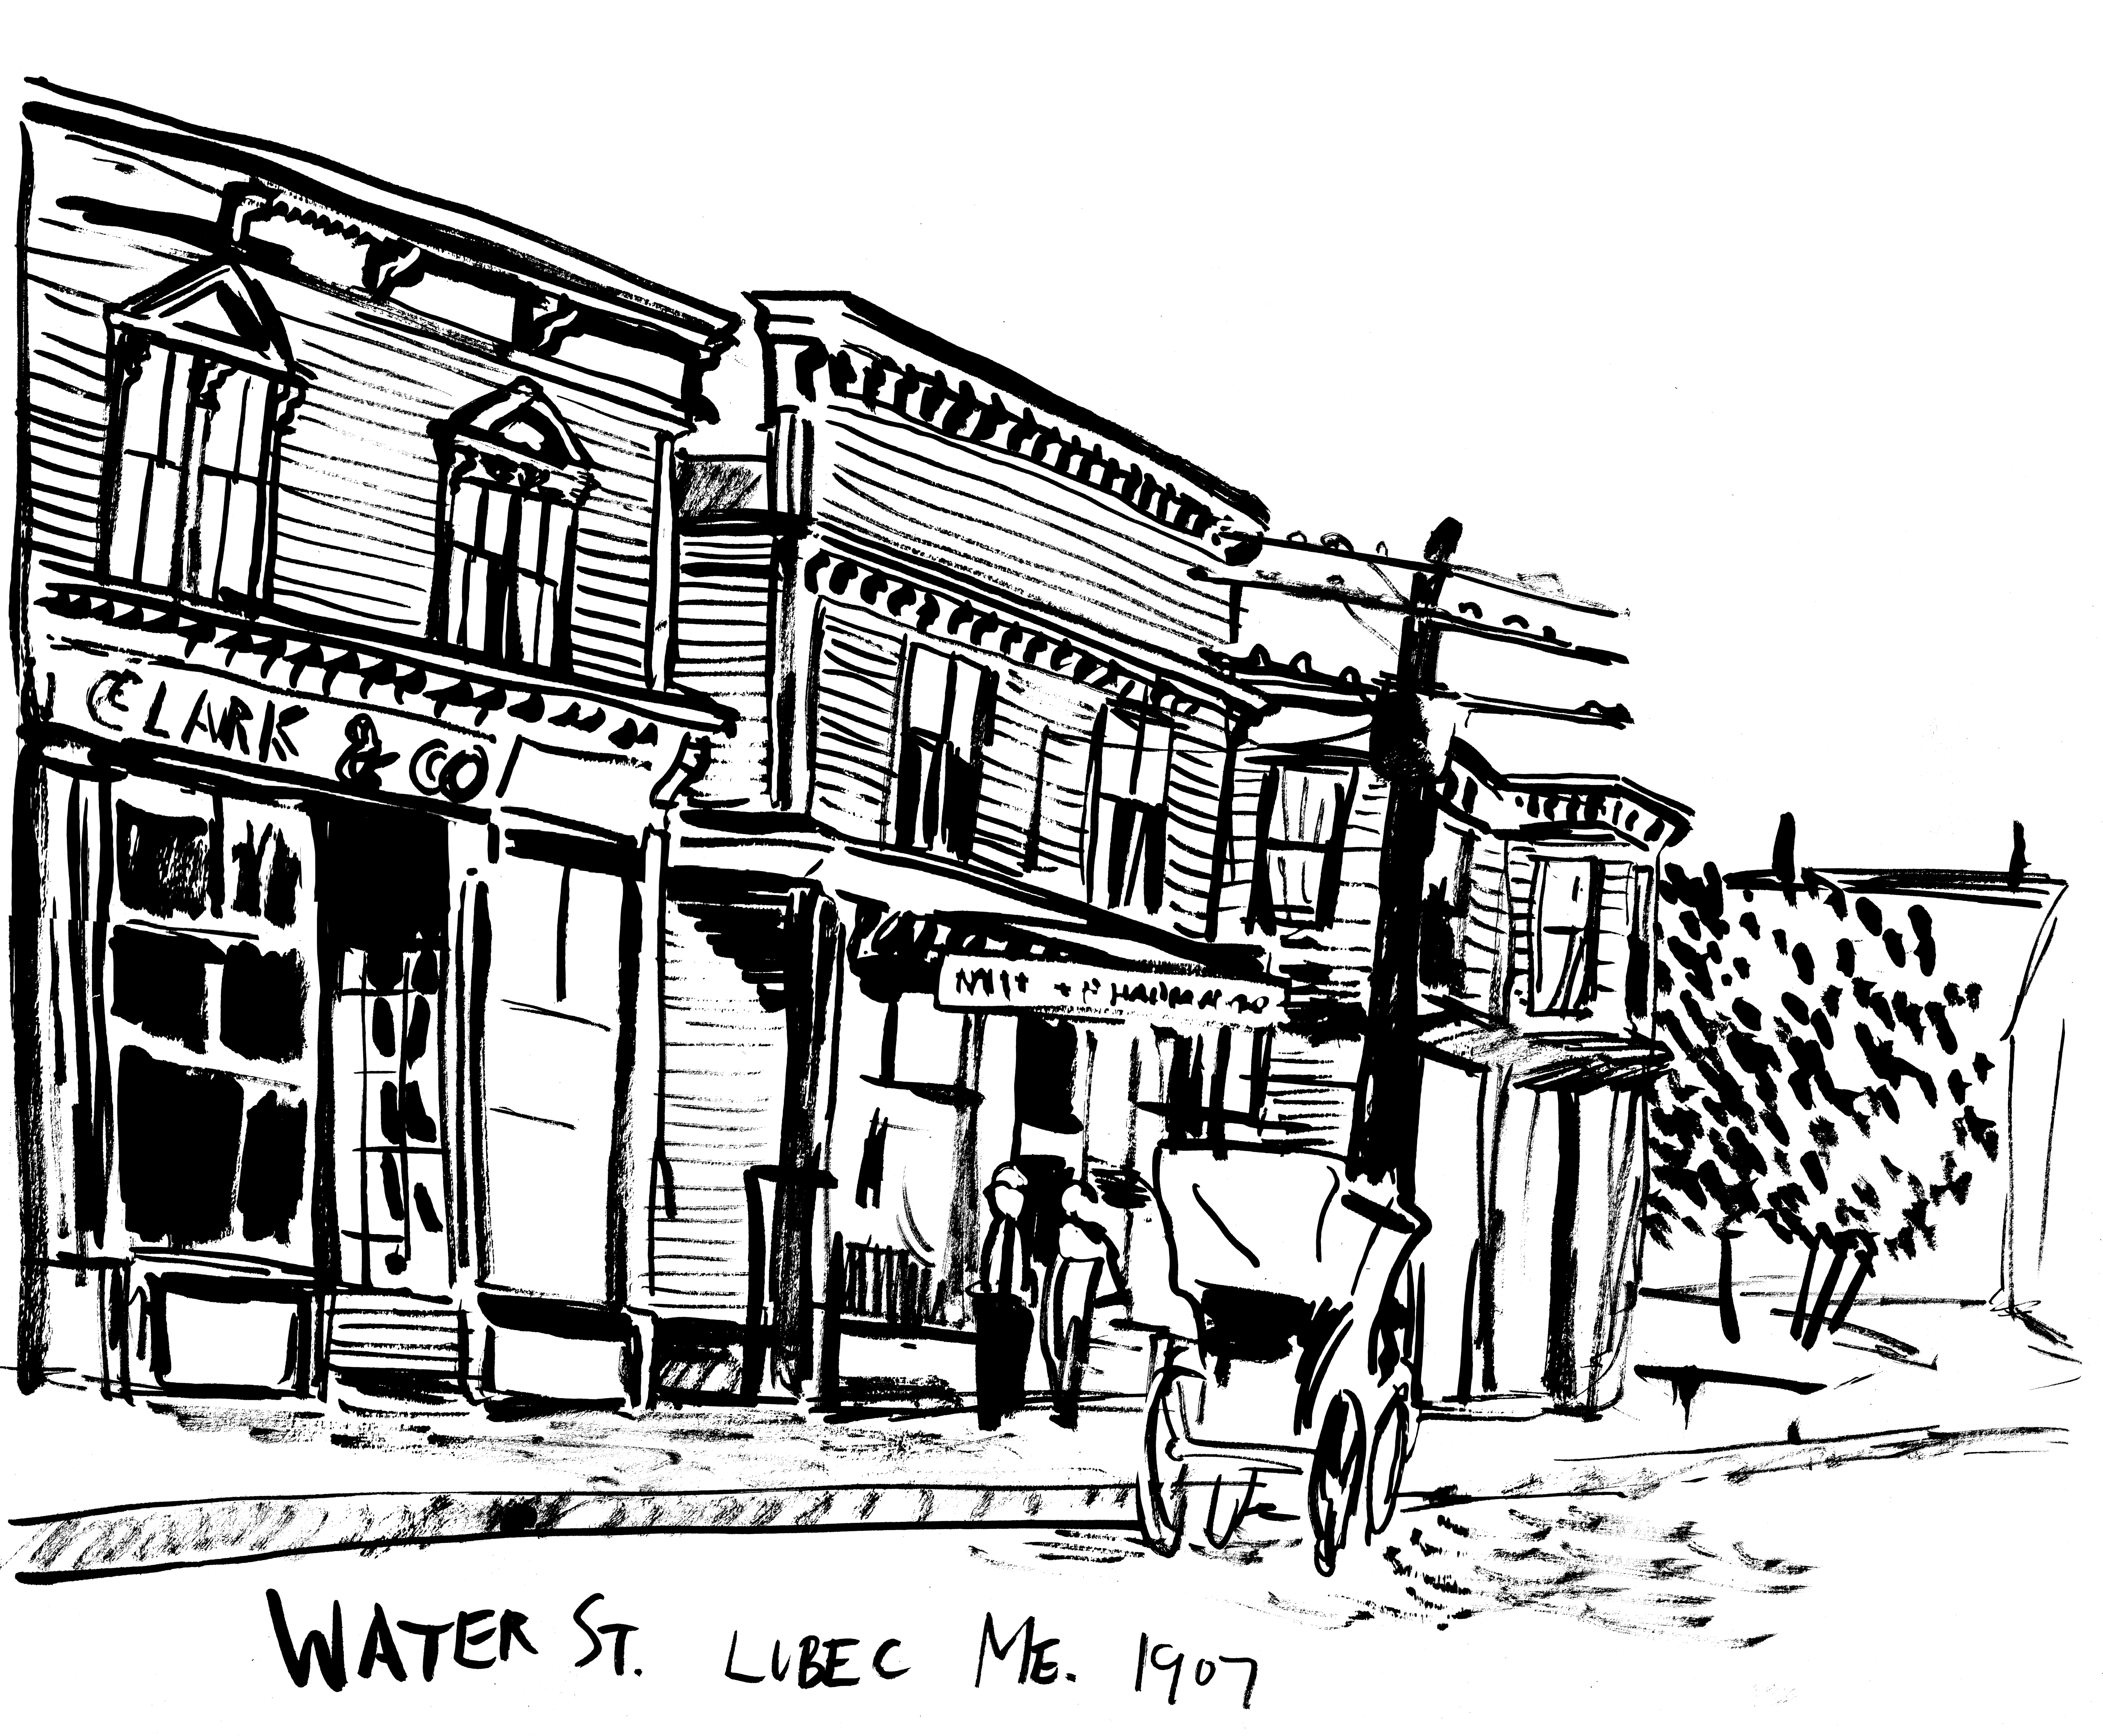 water street 10-12-14